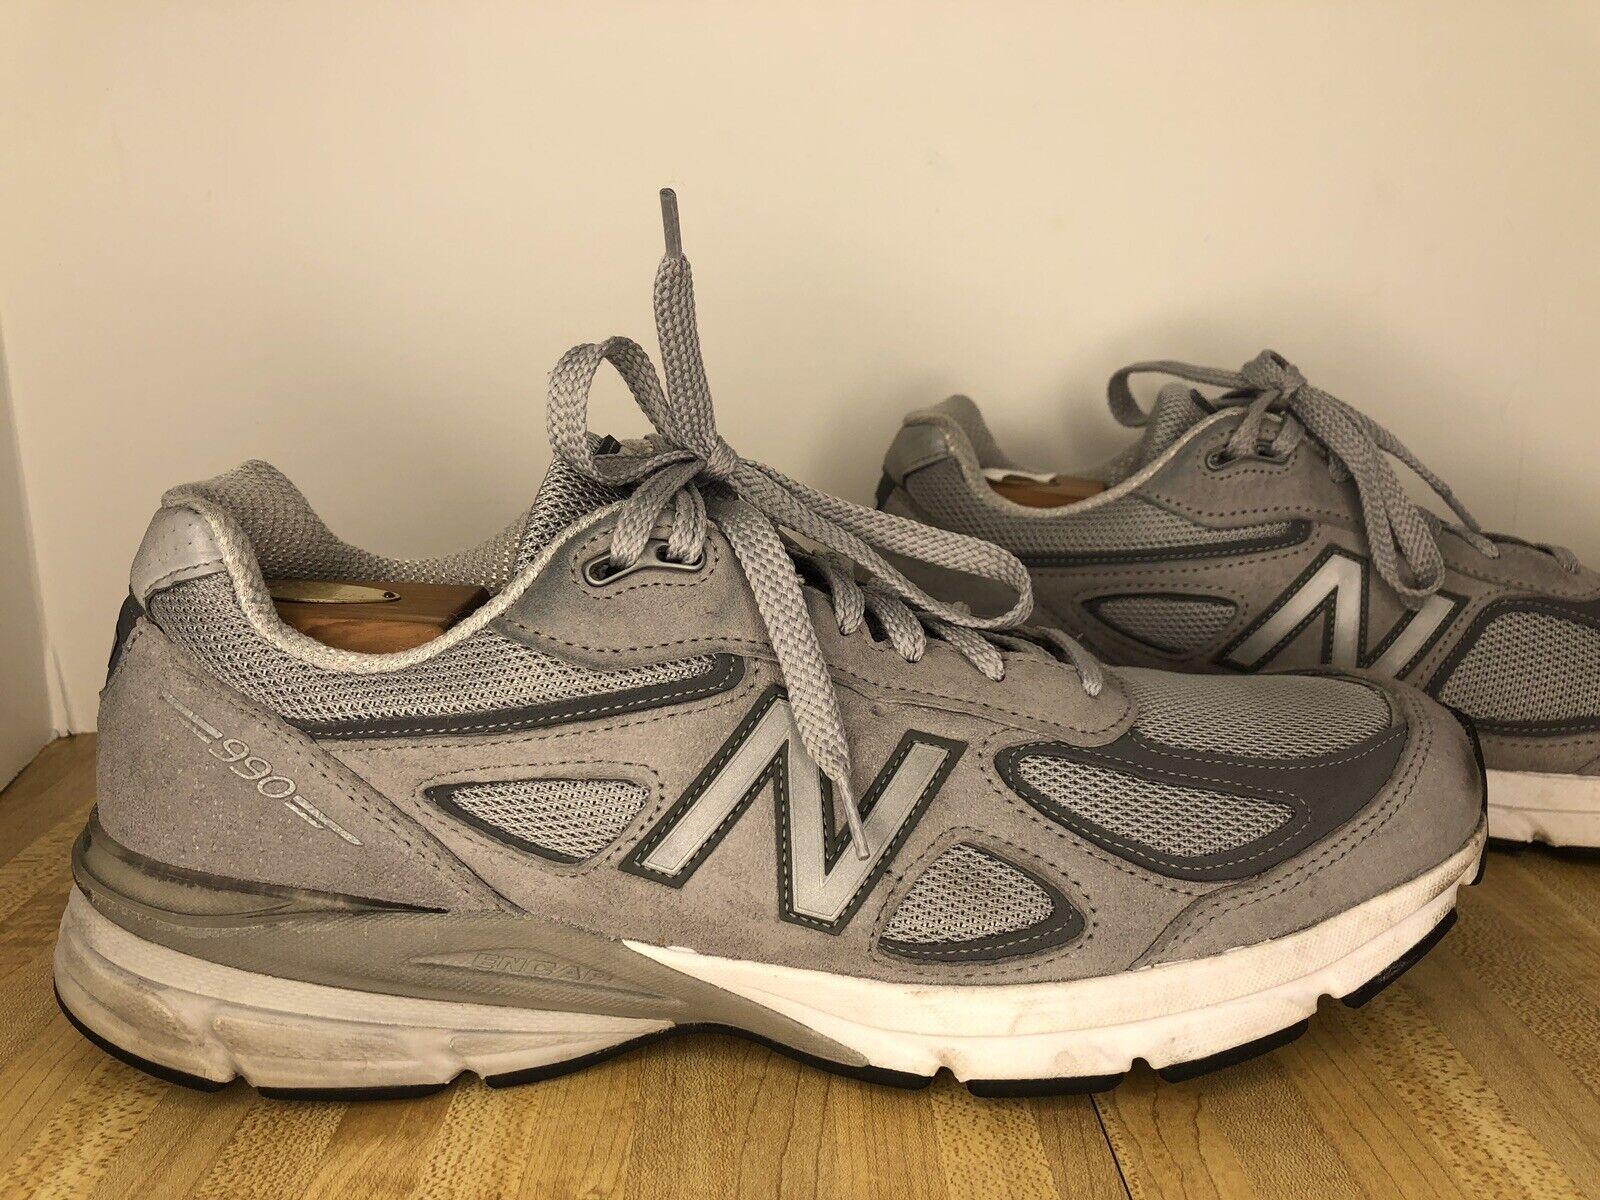 New New New Balance M990GL4 990v4 Running Training Walking shoes 990 Men Size 14(2E).A1 b7d8df